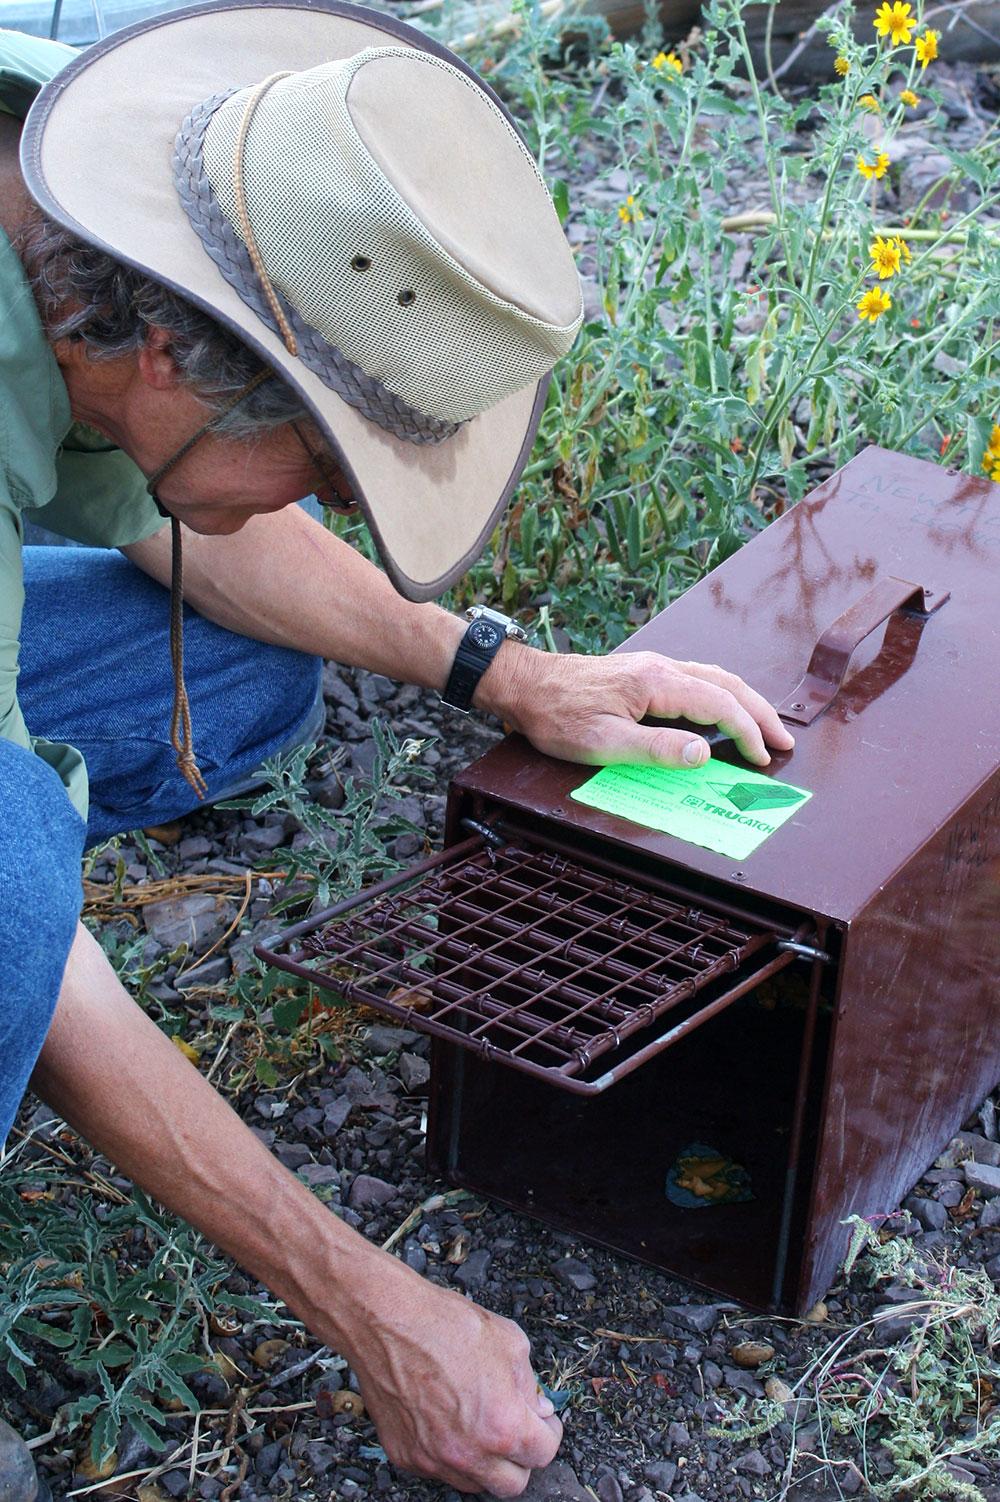 Jamie preparing the skunk trap in the chicken yard. (Cheryl Howard/Borderzine.com)